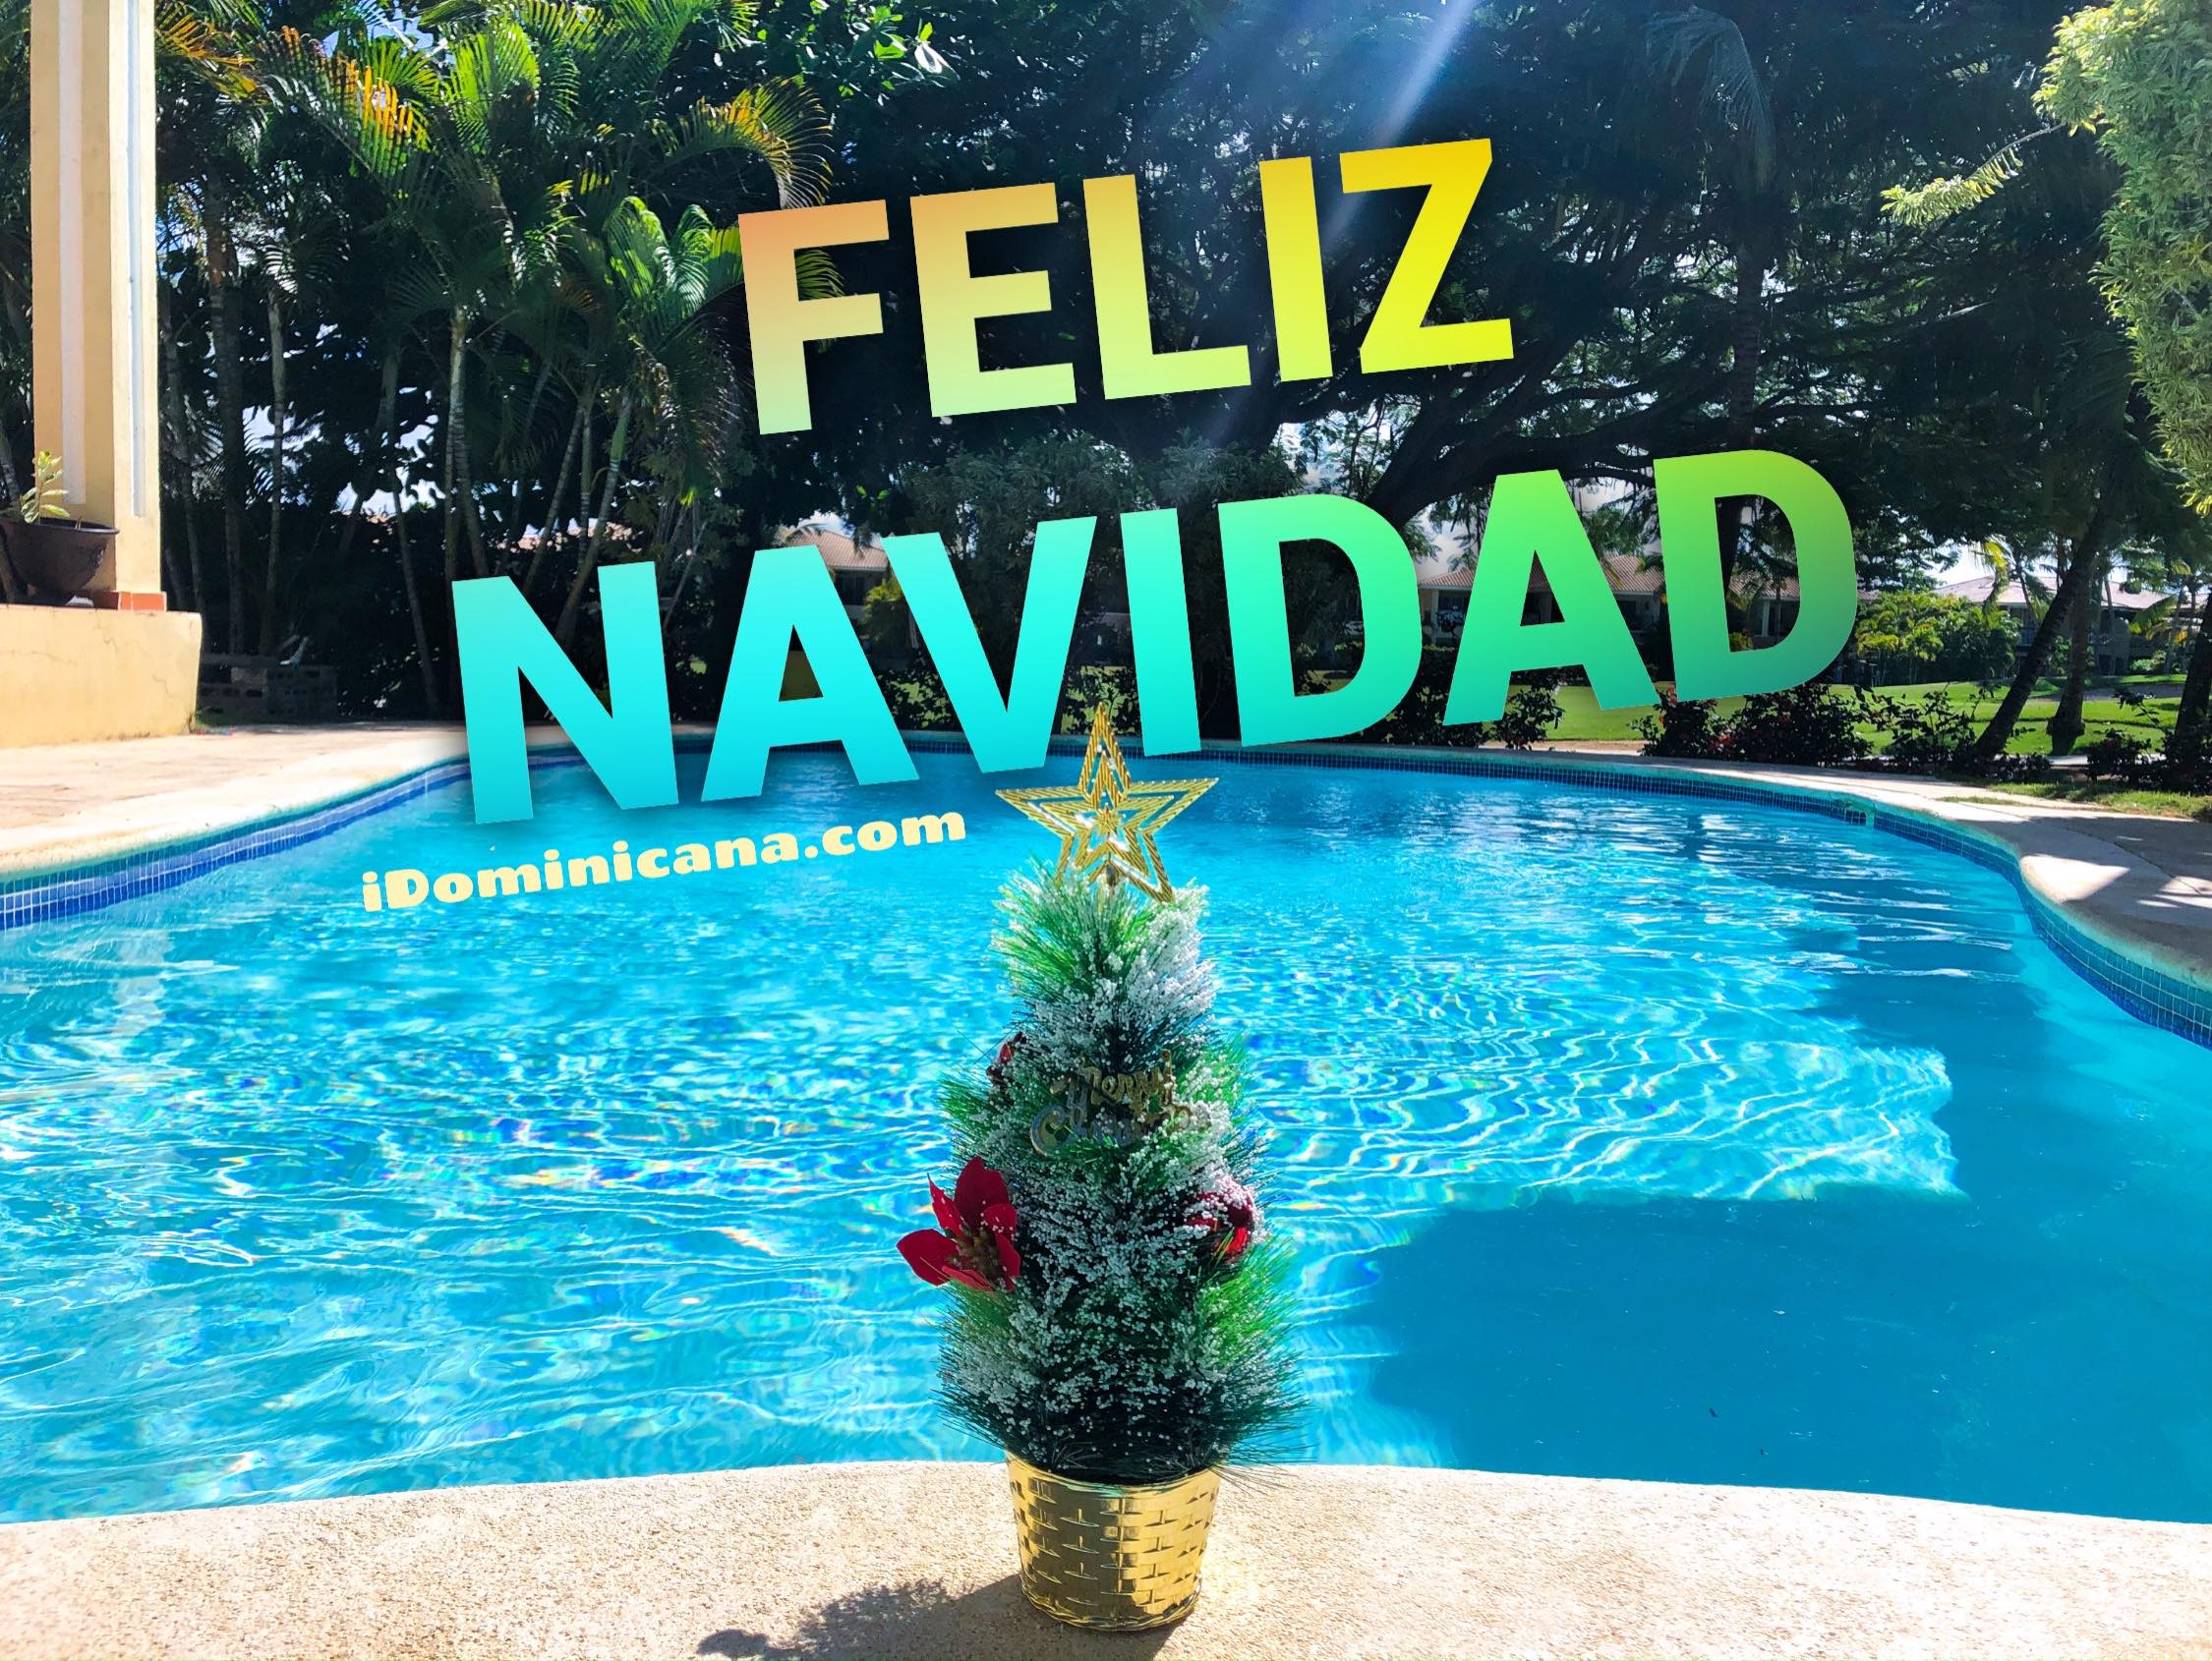 Рождество в Доминикане: когда отмечают, традиции, кухня iDominicana.com